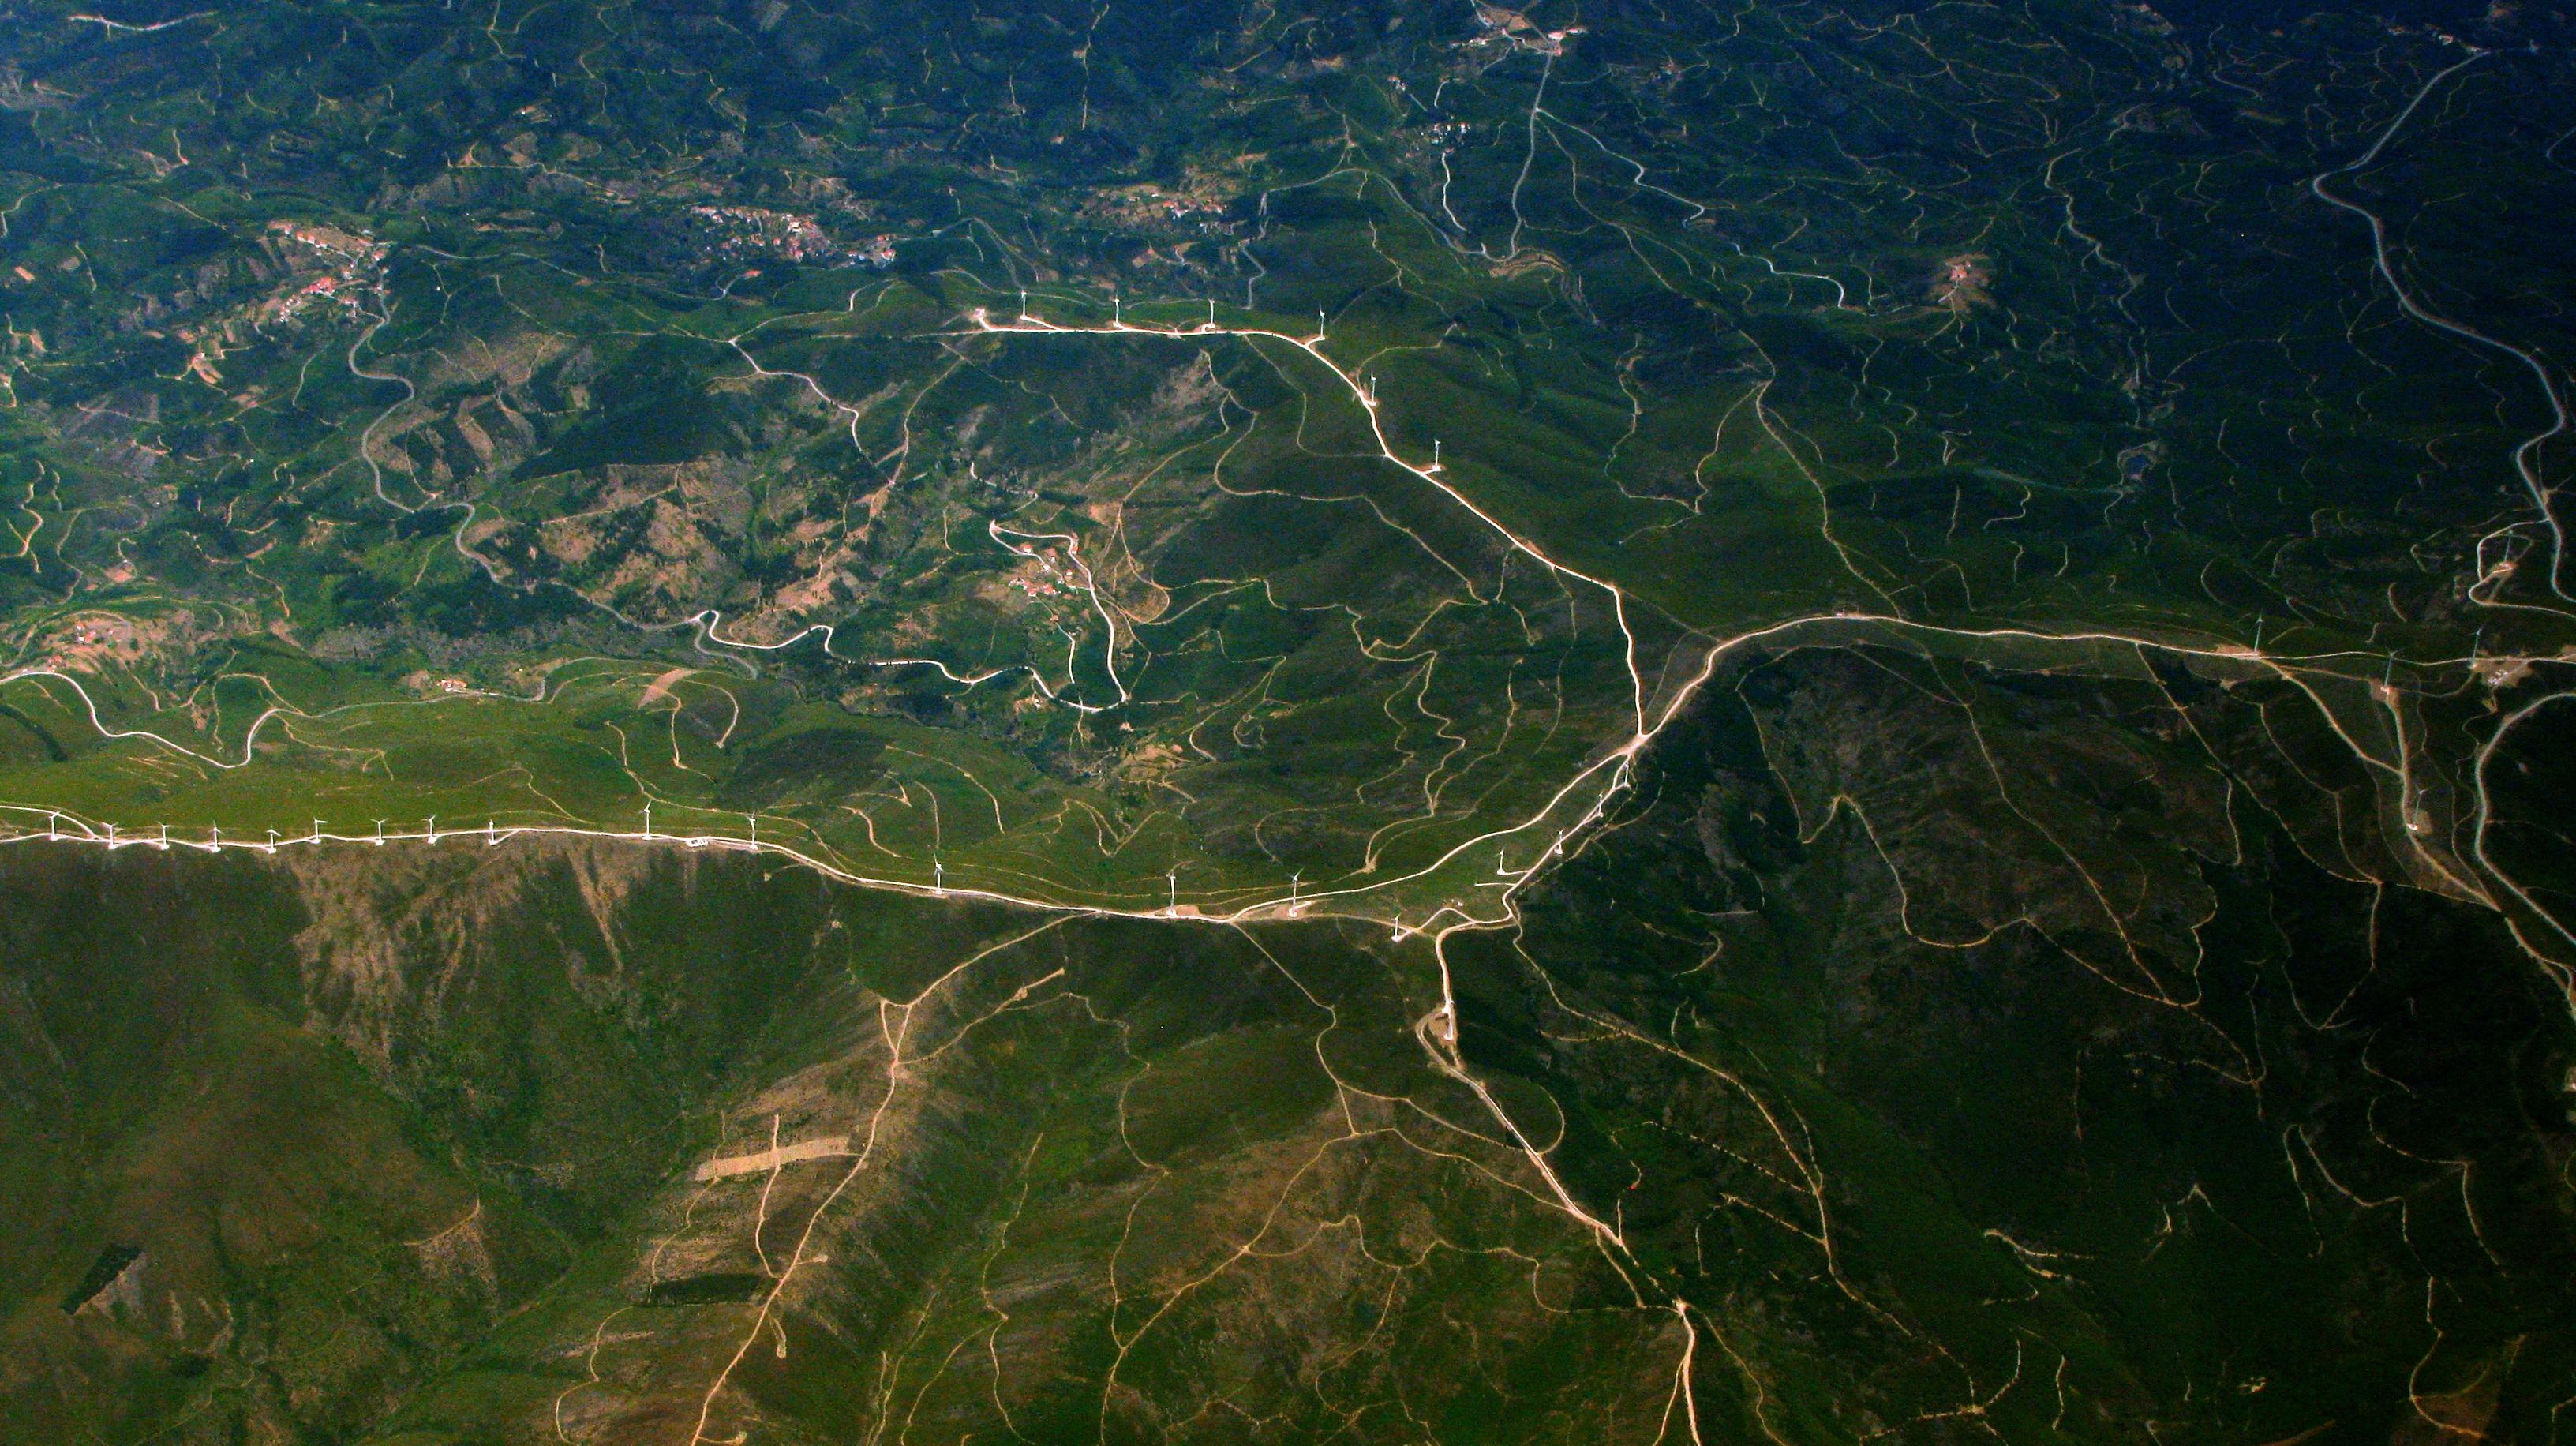 landscape coast road windmill river reflection terrain